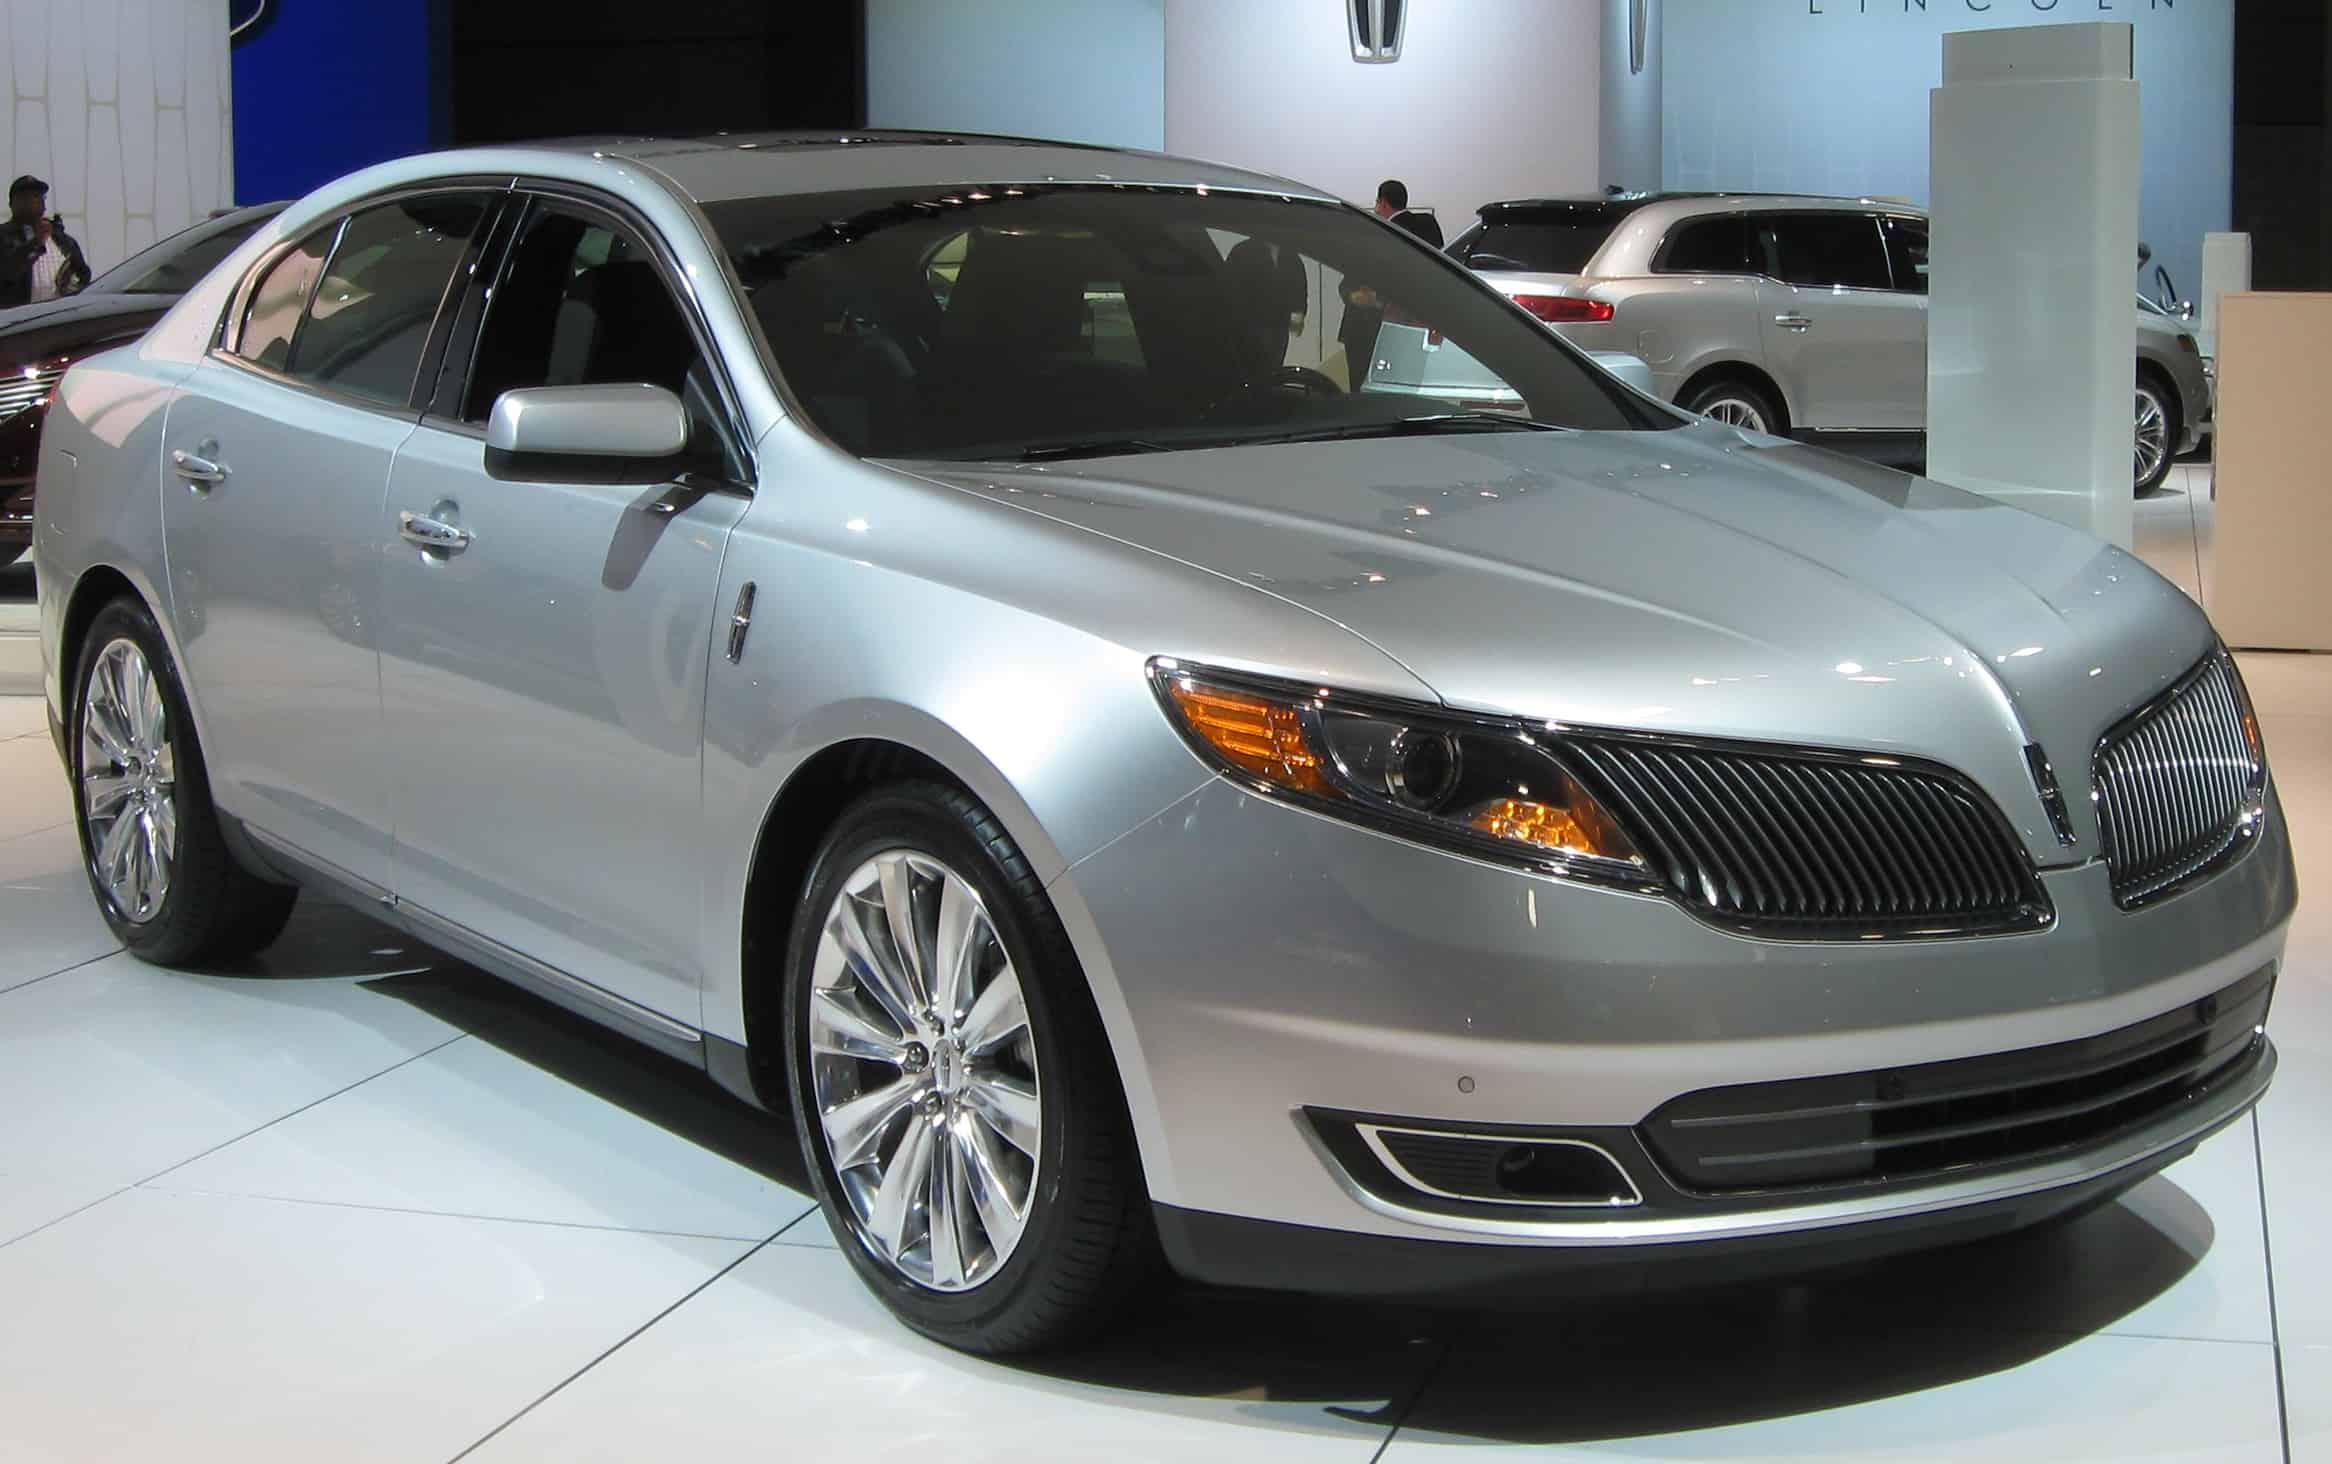 Lincoln MKS Limousine